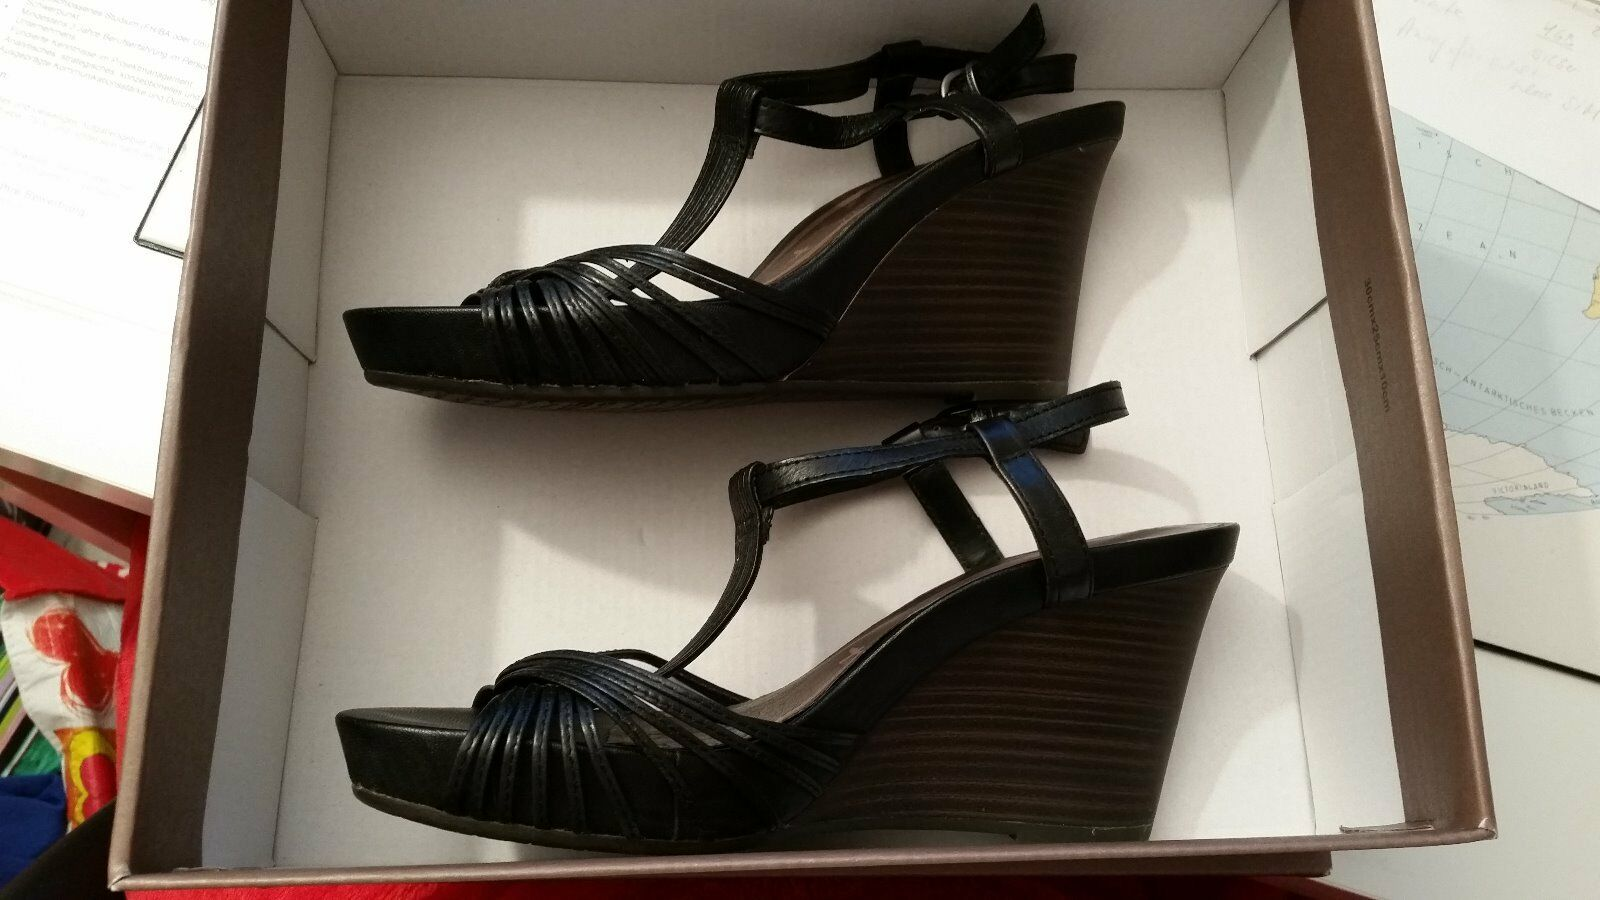 Tamaris Damen Sandalette Schuhe Sandalen schwarz Keilabsatz Leather Cuir 38